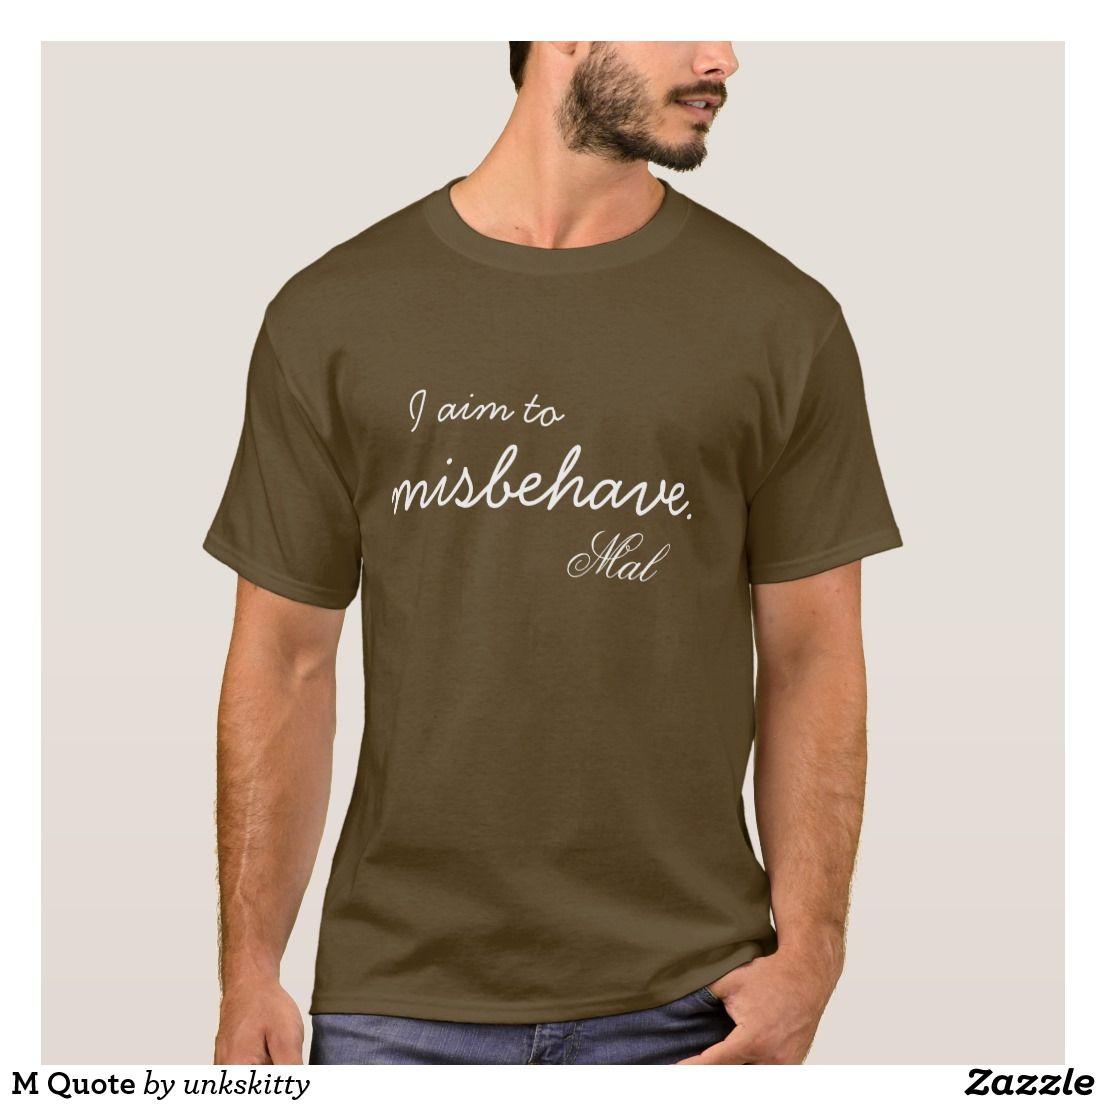 M Quote T Shirt Zazzle Com Shirts T Shirt Shirt Designs